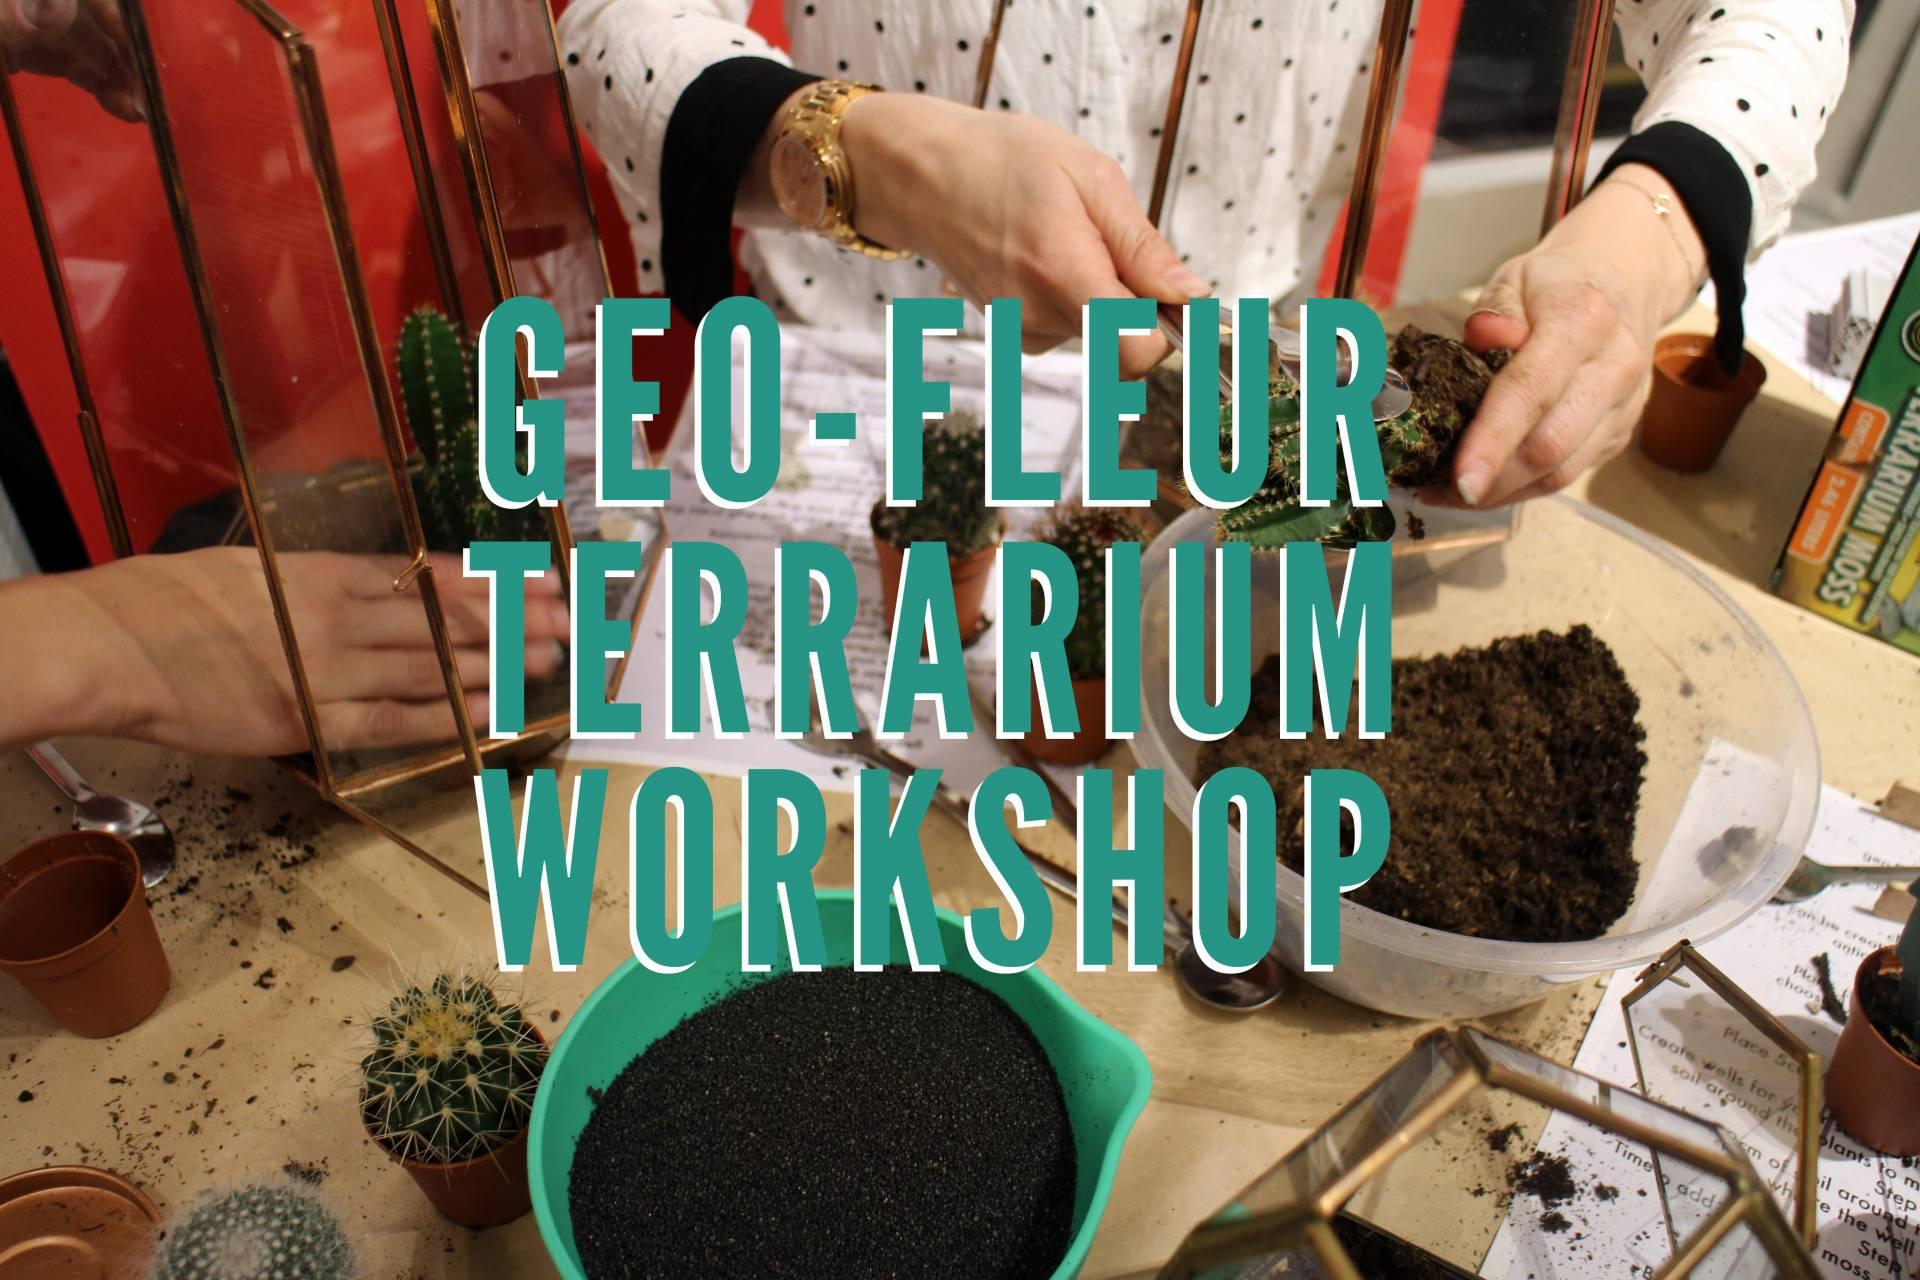 http://graphiquefantastique.com/wp-content/uploads/2015/10/Geo-Fleur-Terrarium-Workshop.jpg